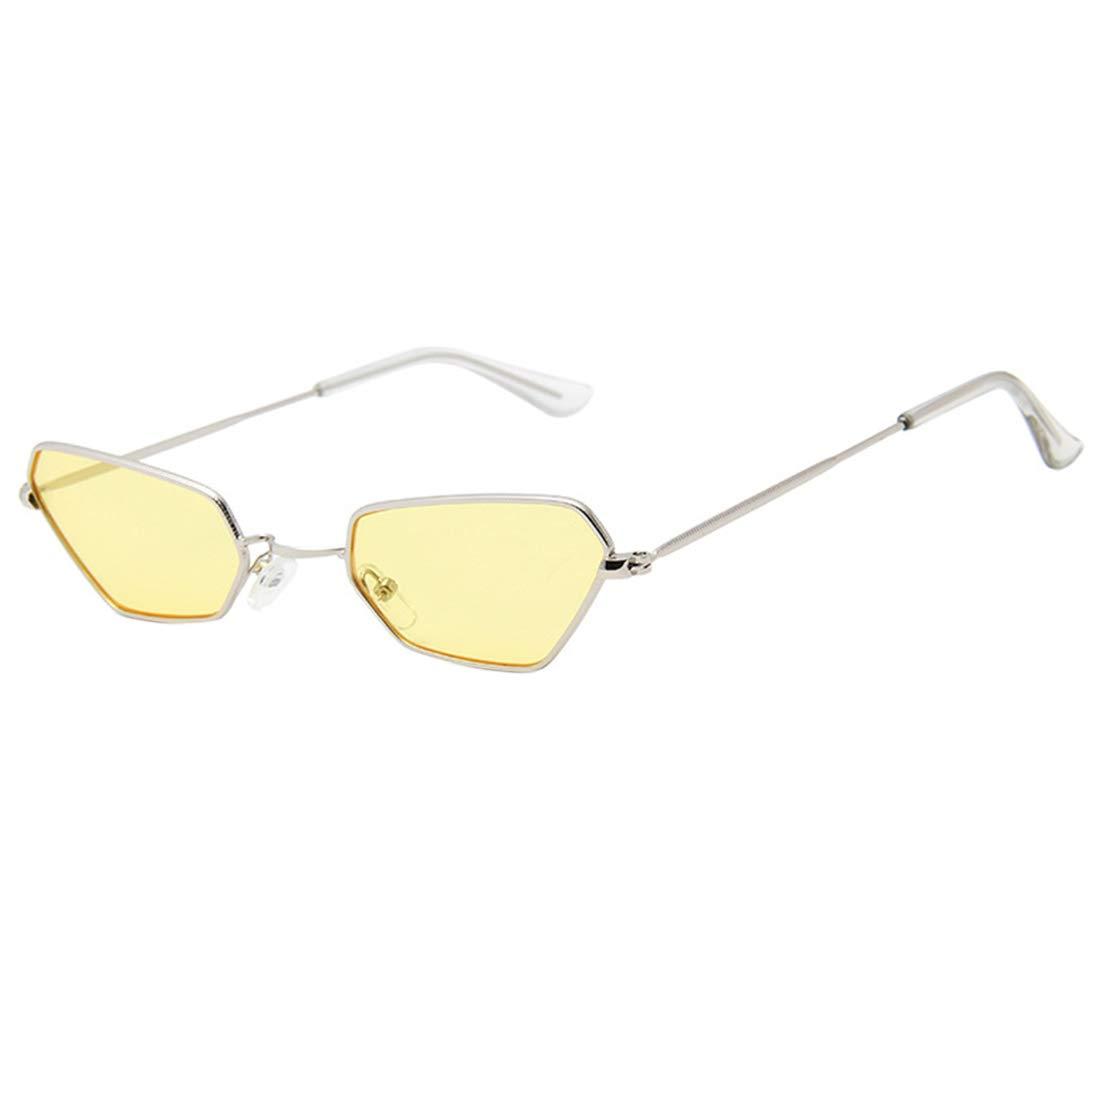 HUAYI Unisex UV400 Retro Polygon Silvery Small Frame Sunshade Sunglasses